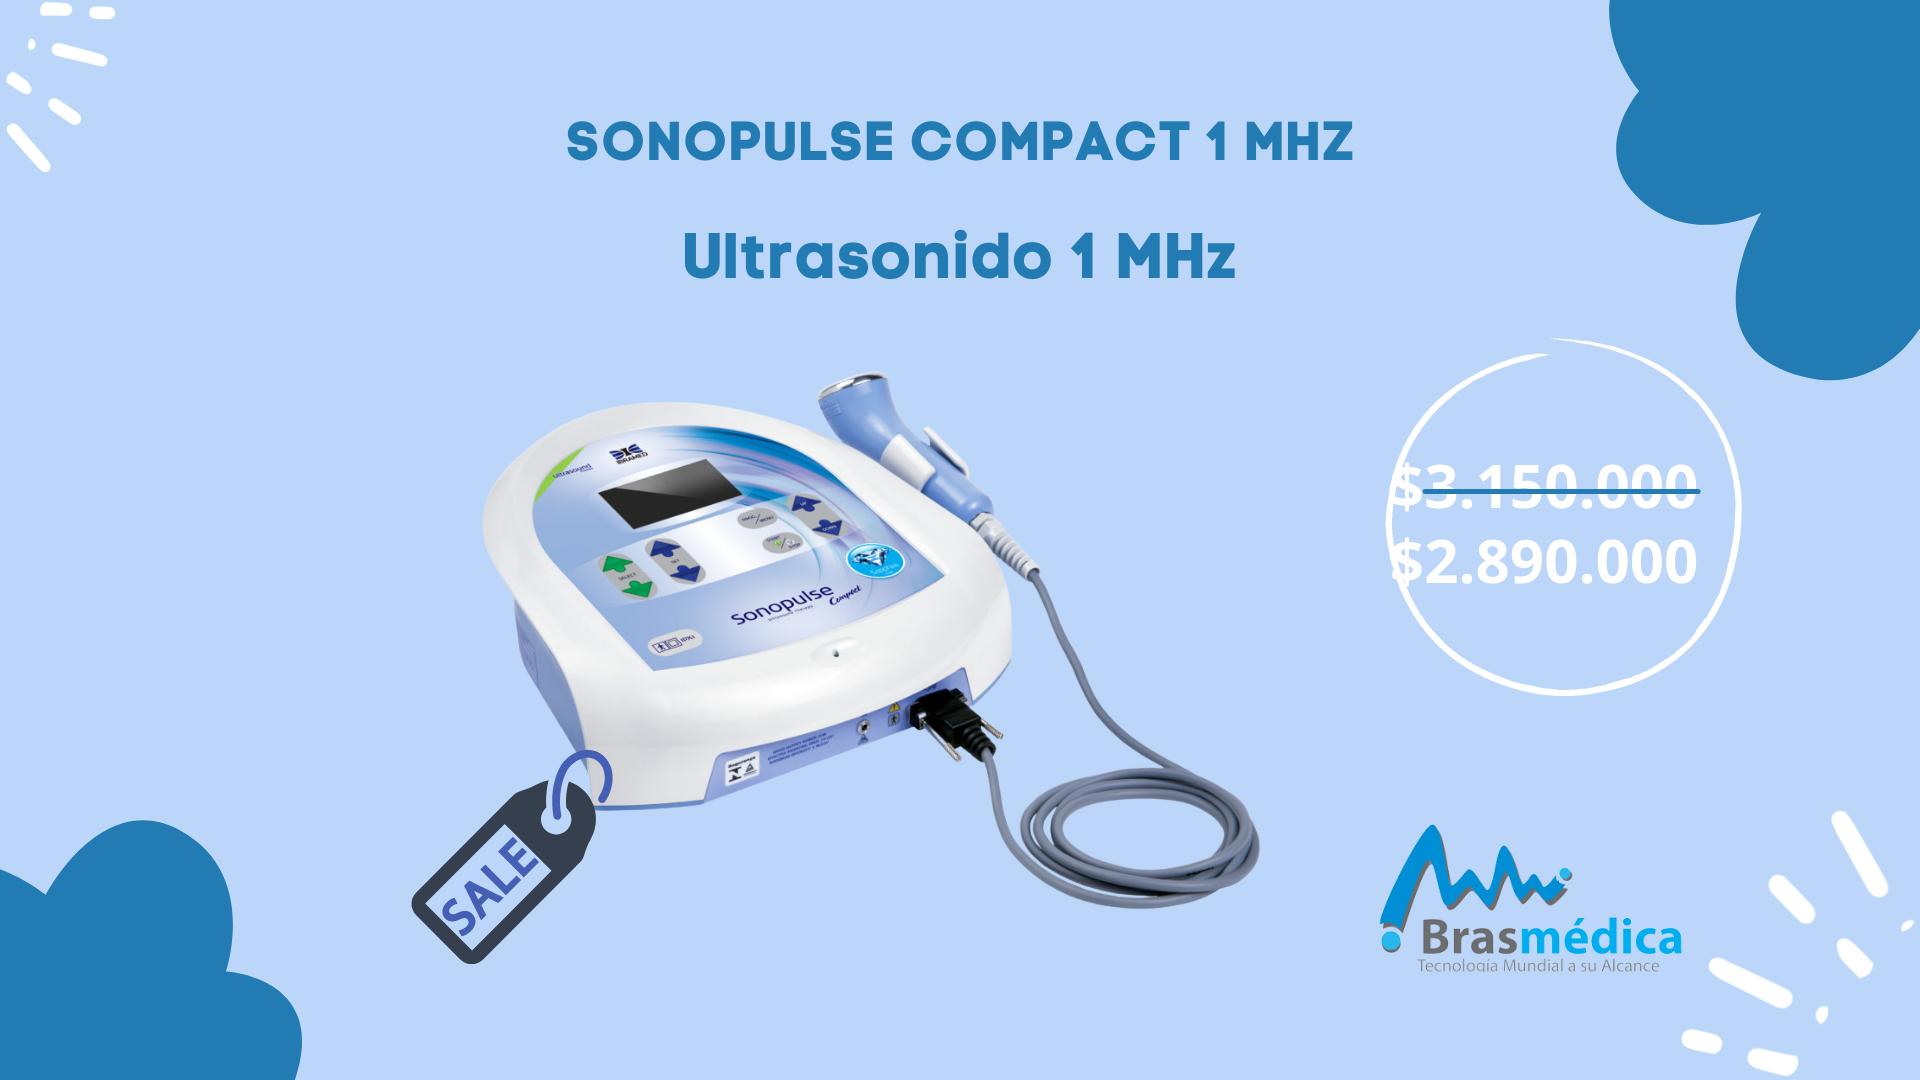 Sonopulse compact  Ultrasonido 1MGHZ